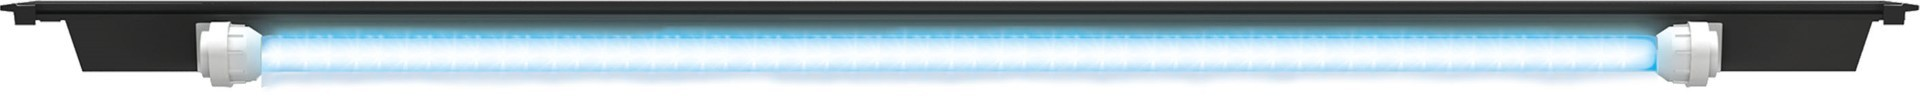 Juwel balk LED 80 cm 2x14 Watt inclusief lamp